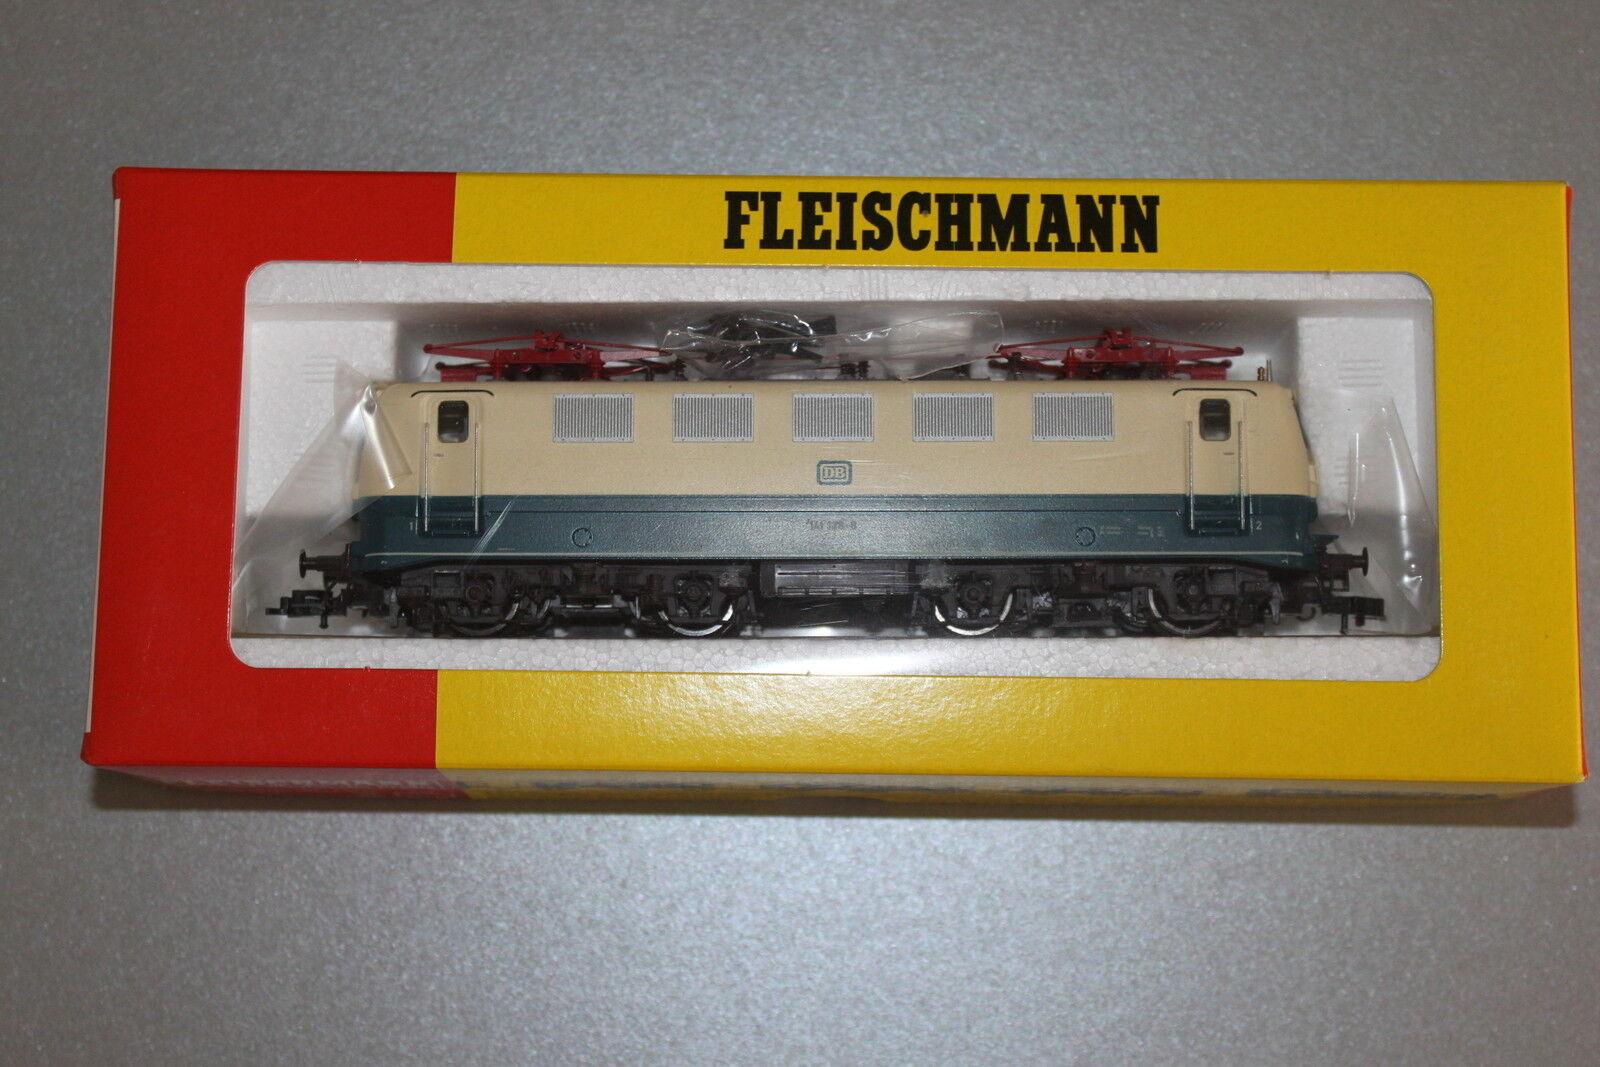 Más asequible Fleischmann 4328 elok serie 141 128-9 DB azul beige pista pista pista h0 OVP  apresurado a ver